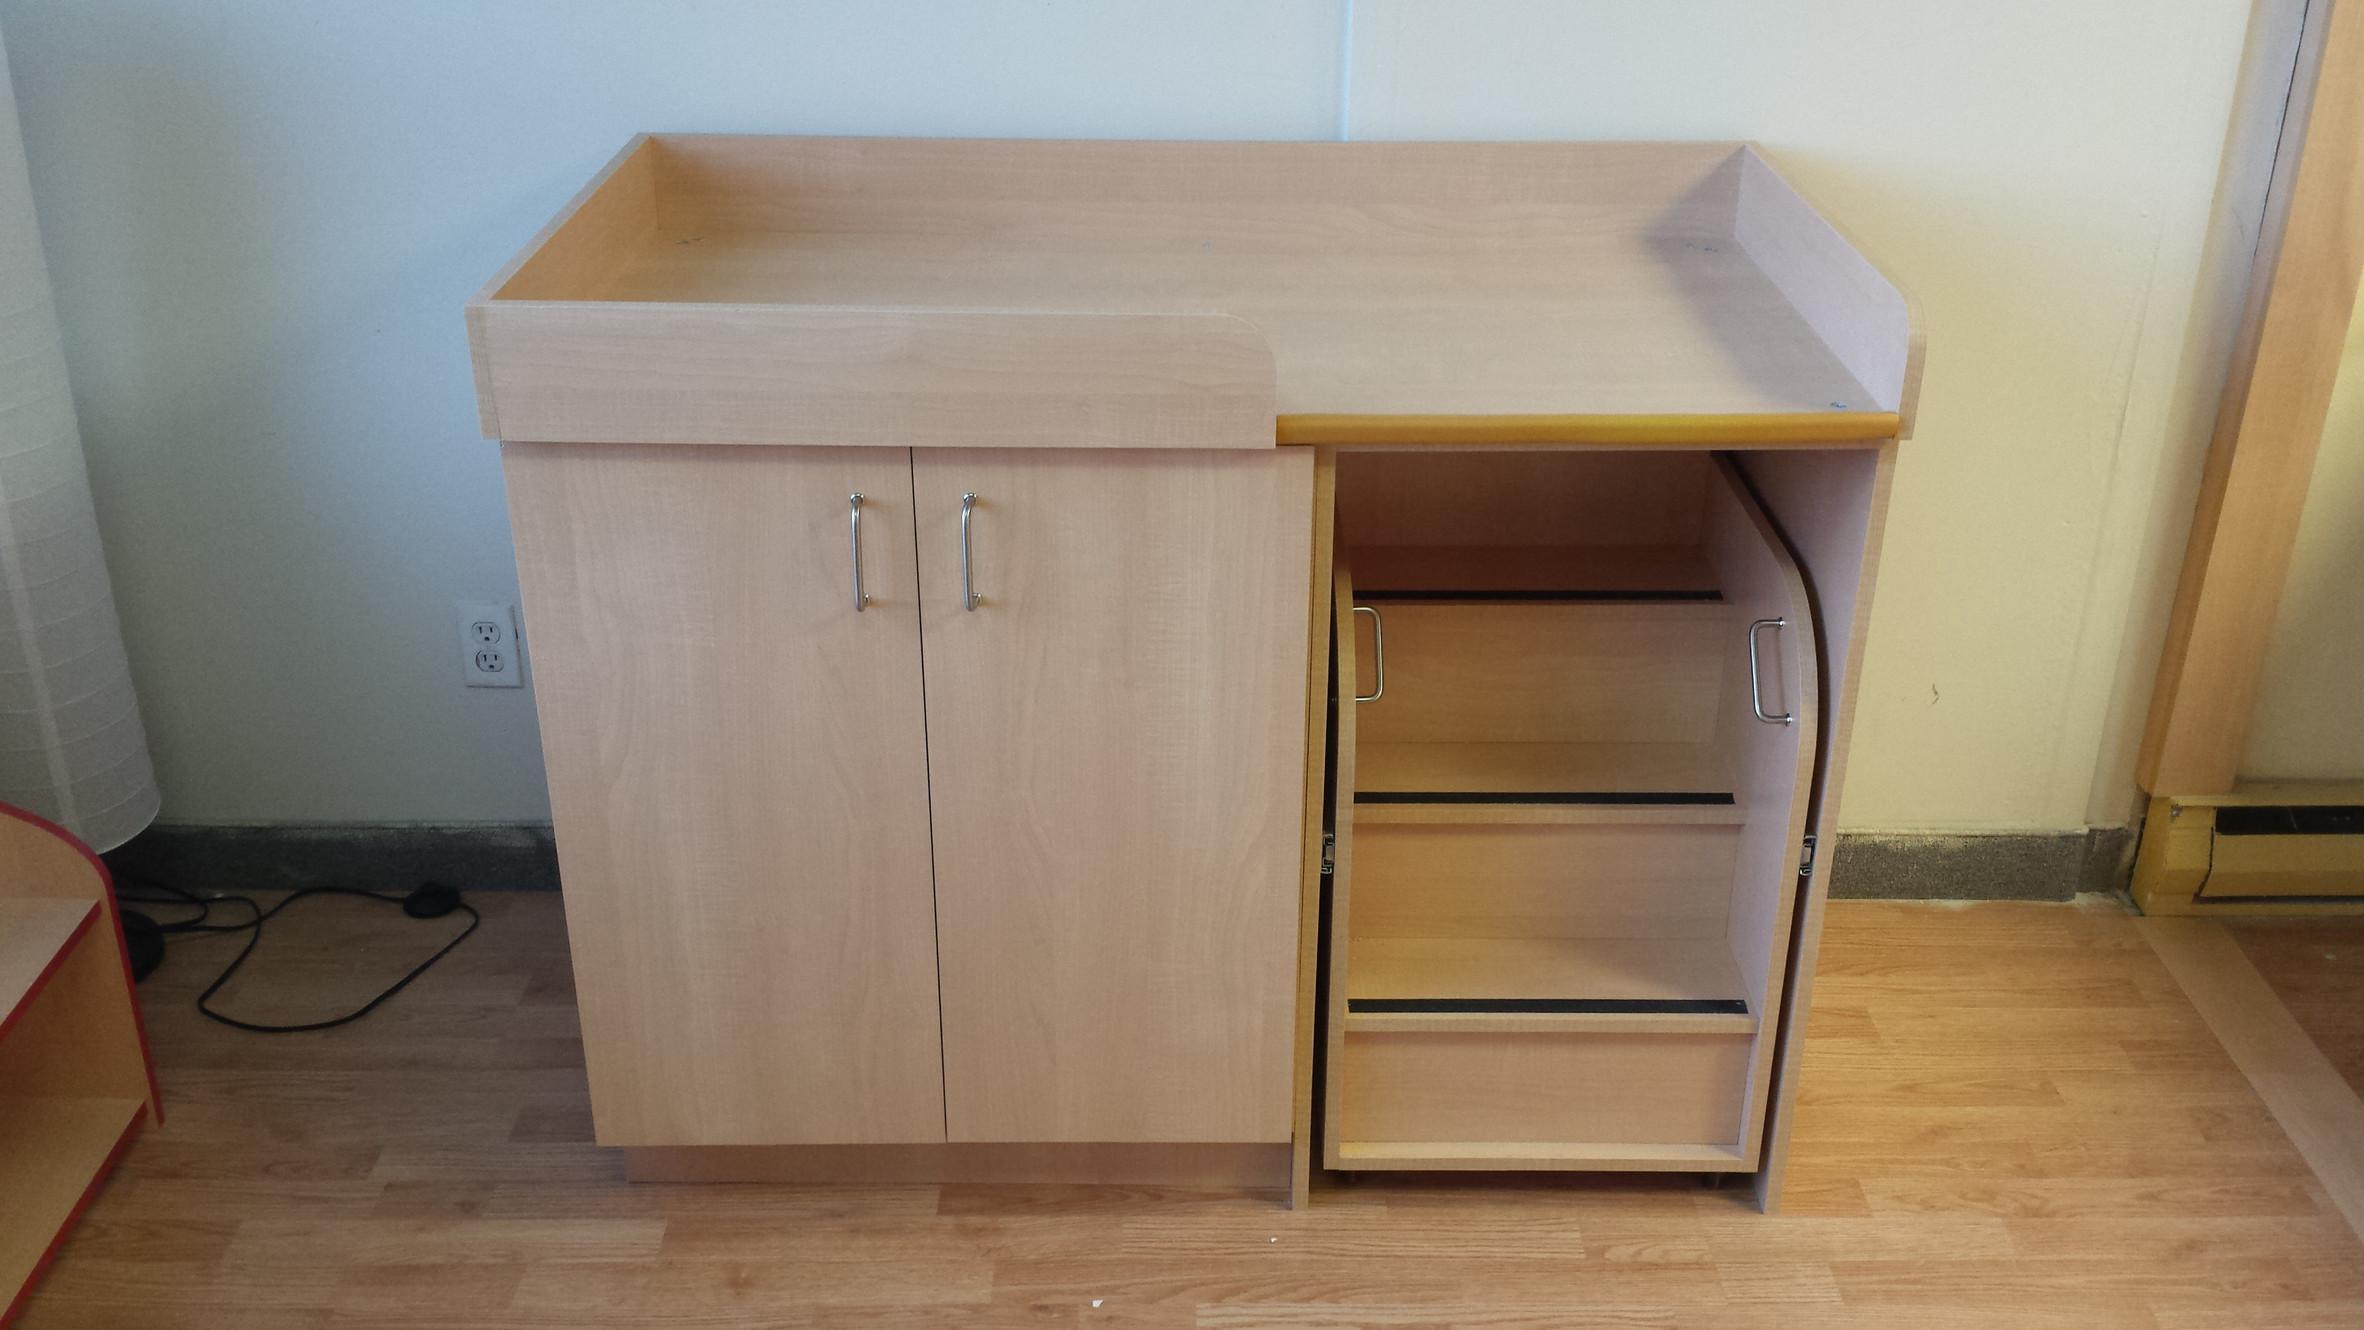 Meuble De Rangement Pour Garderie meuble garderie montréal, ameublement pour garderie, table a